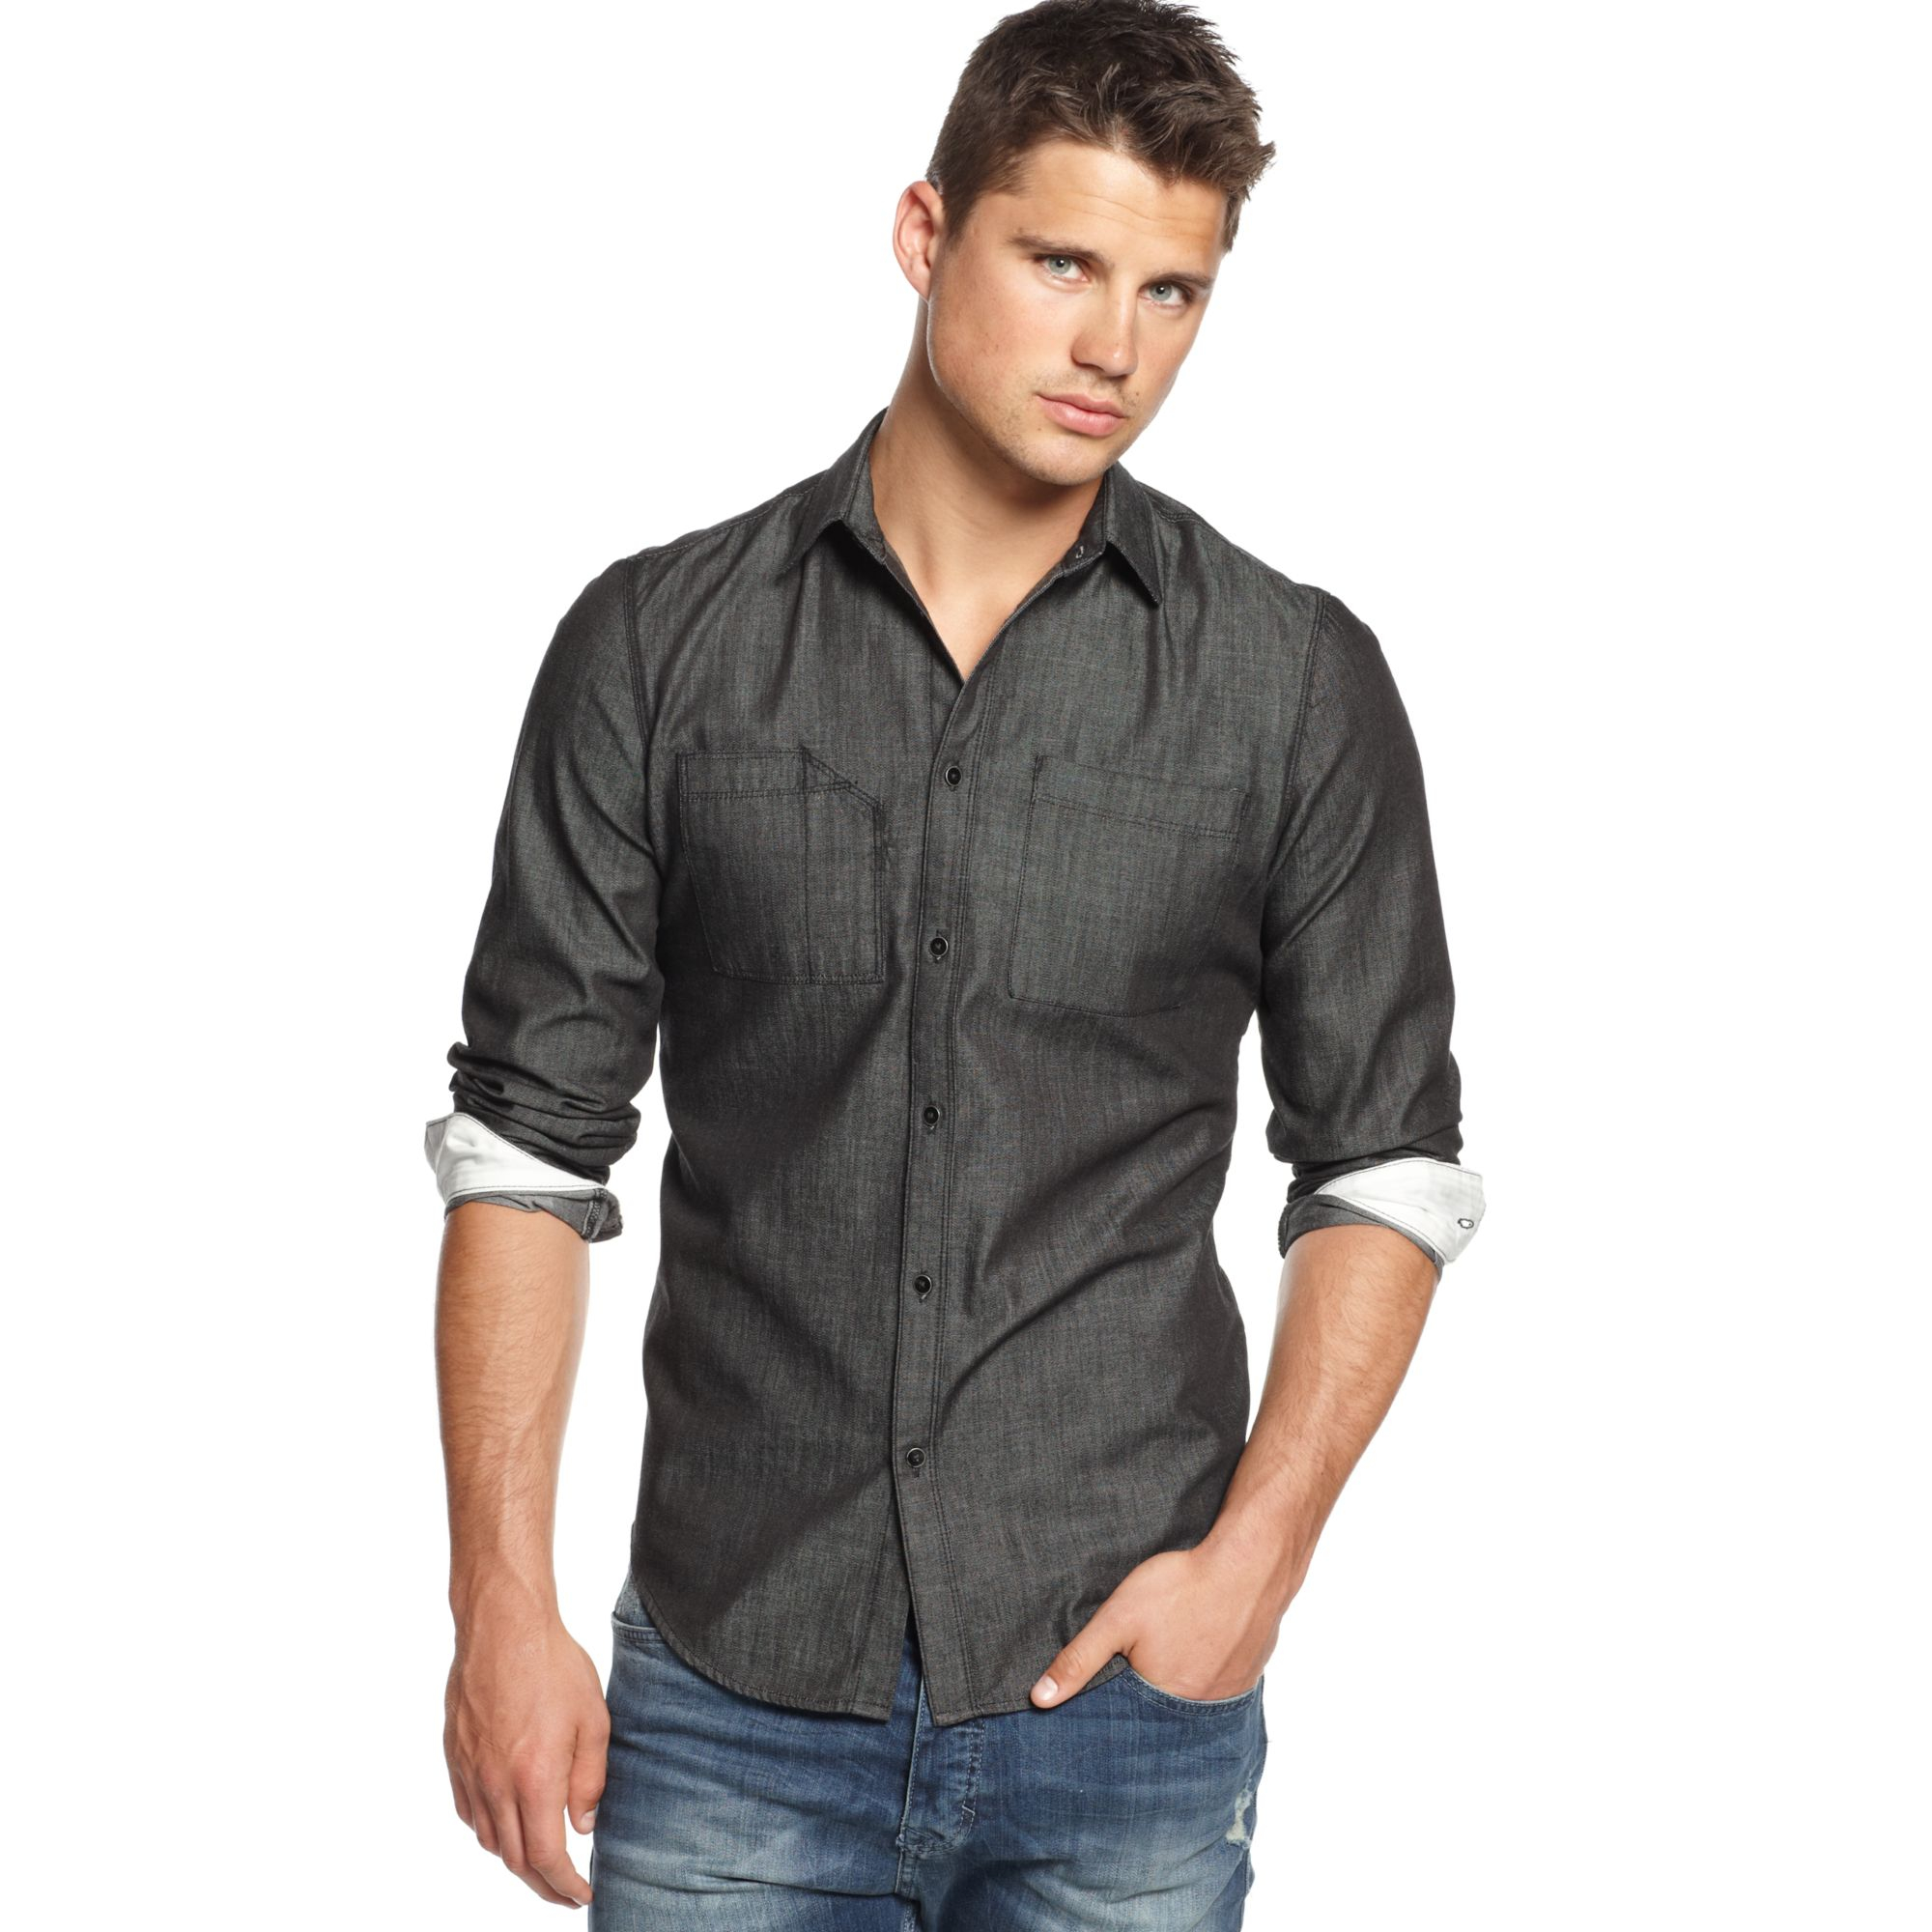 927f5f9d4102 Calvin Klein Chambray Shirt in Black for Men - Lyst